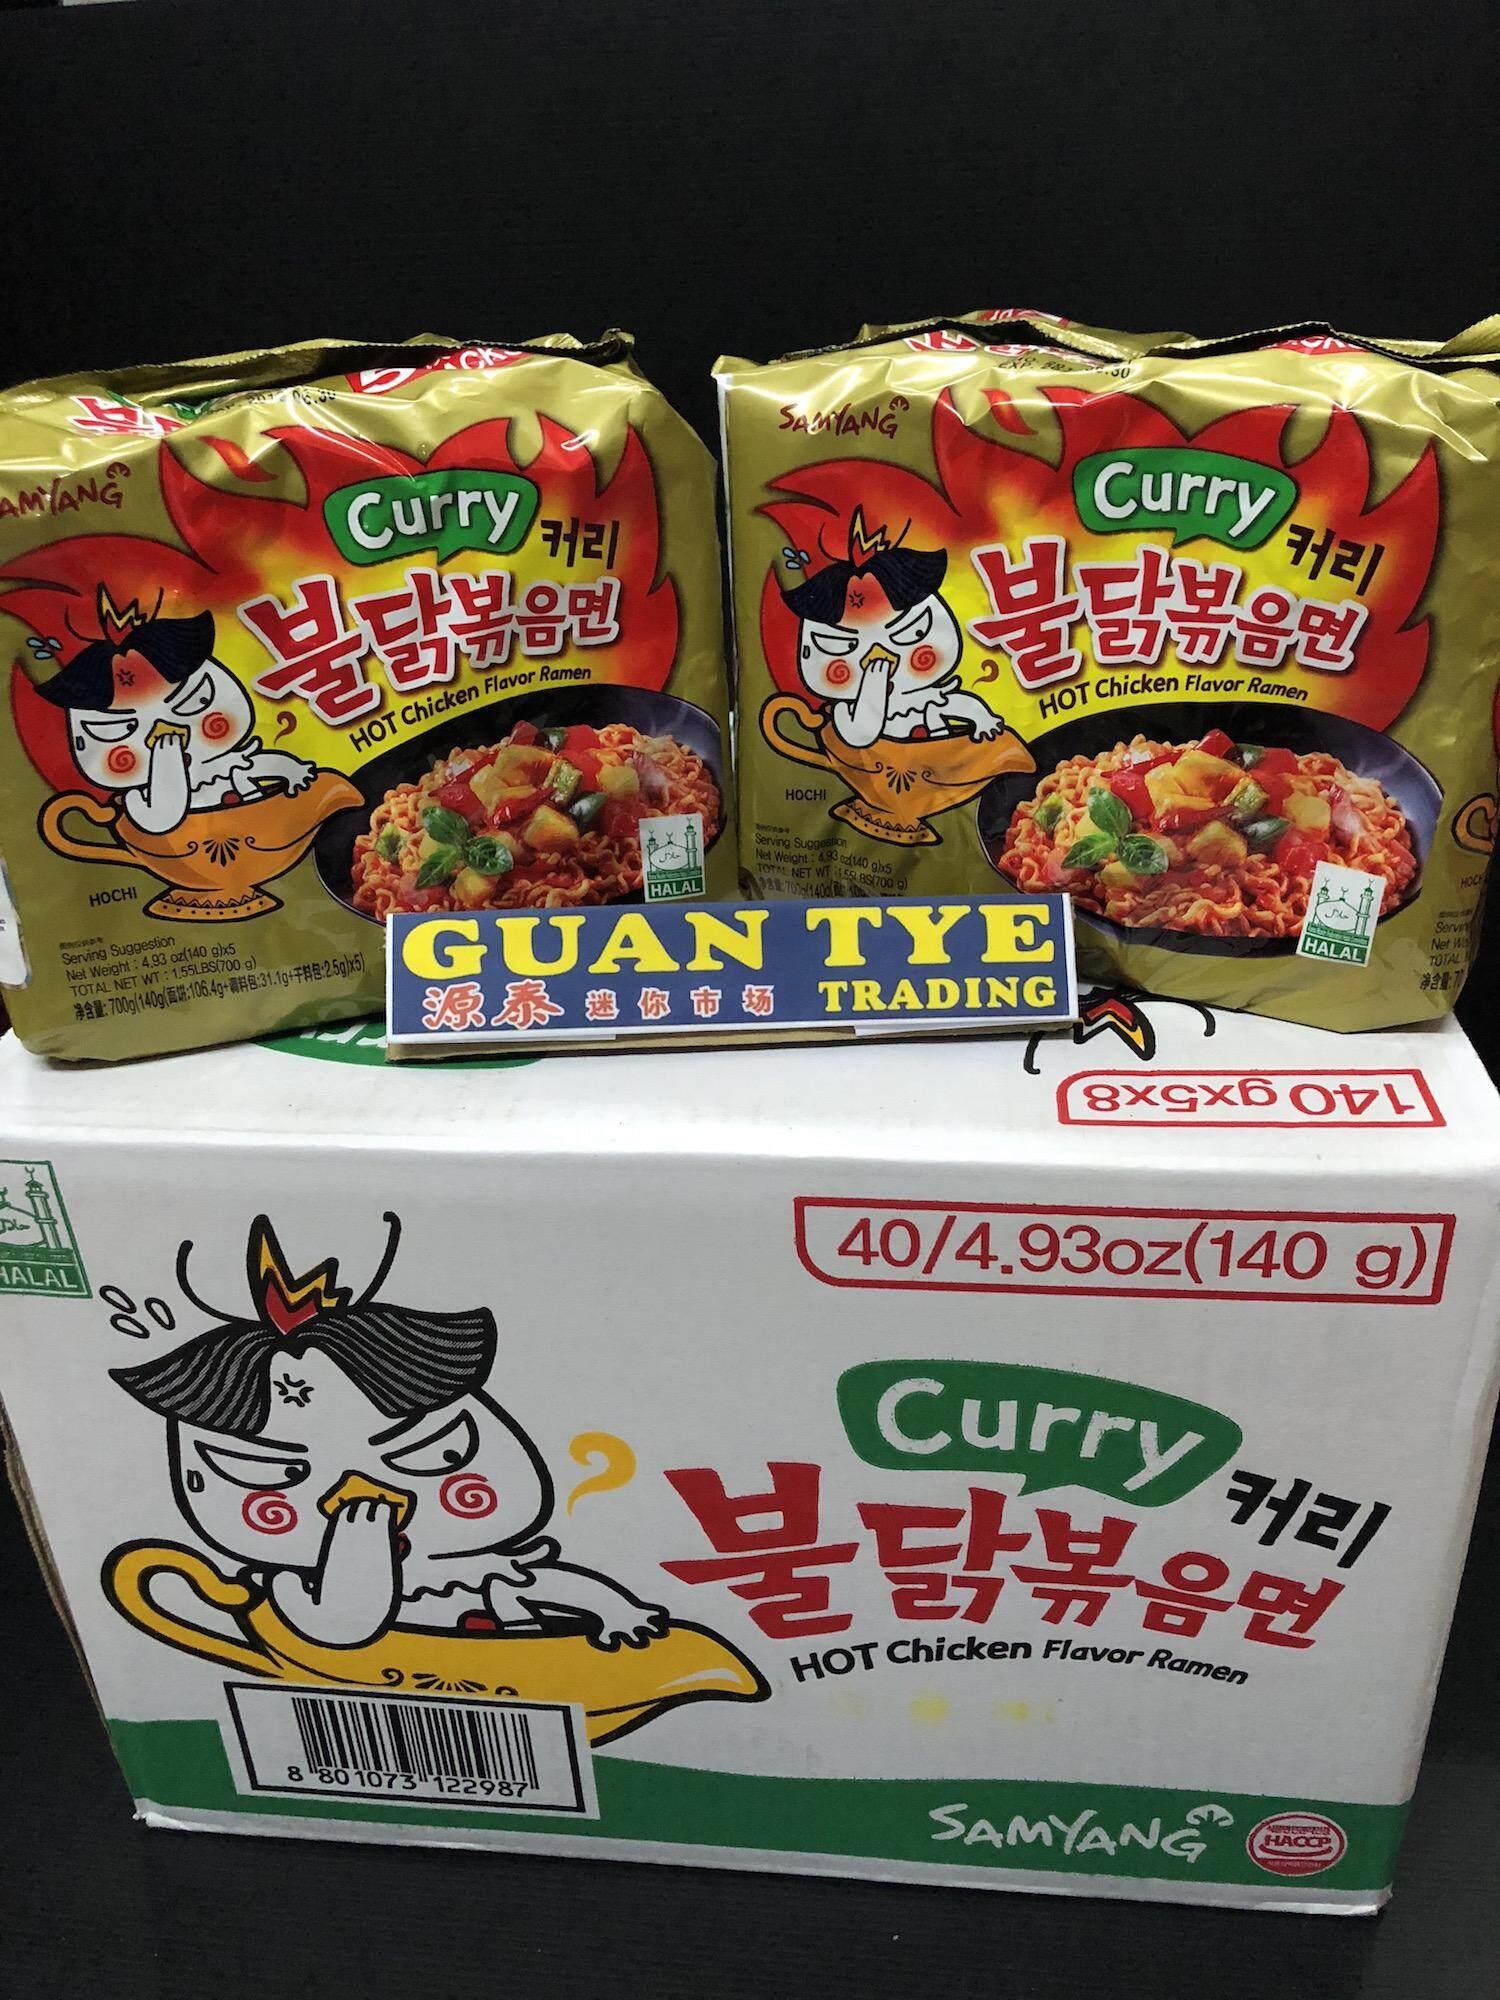 halal samyang curry 1 ctn